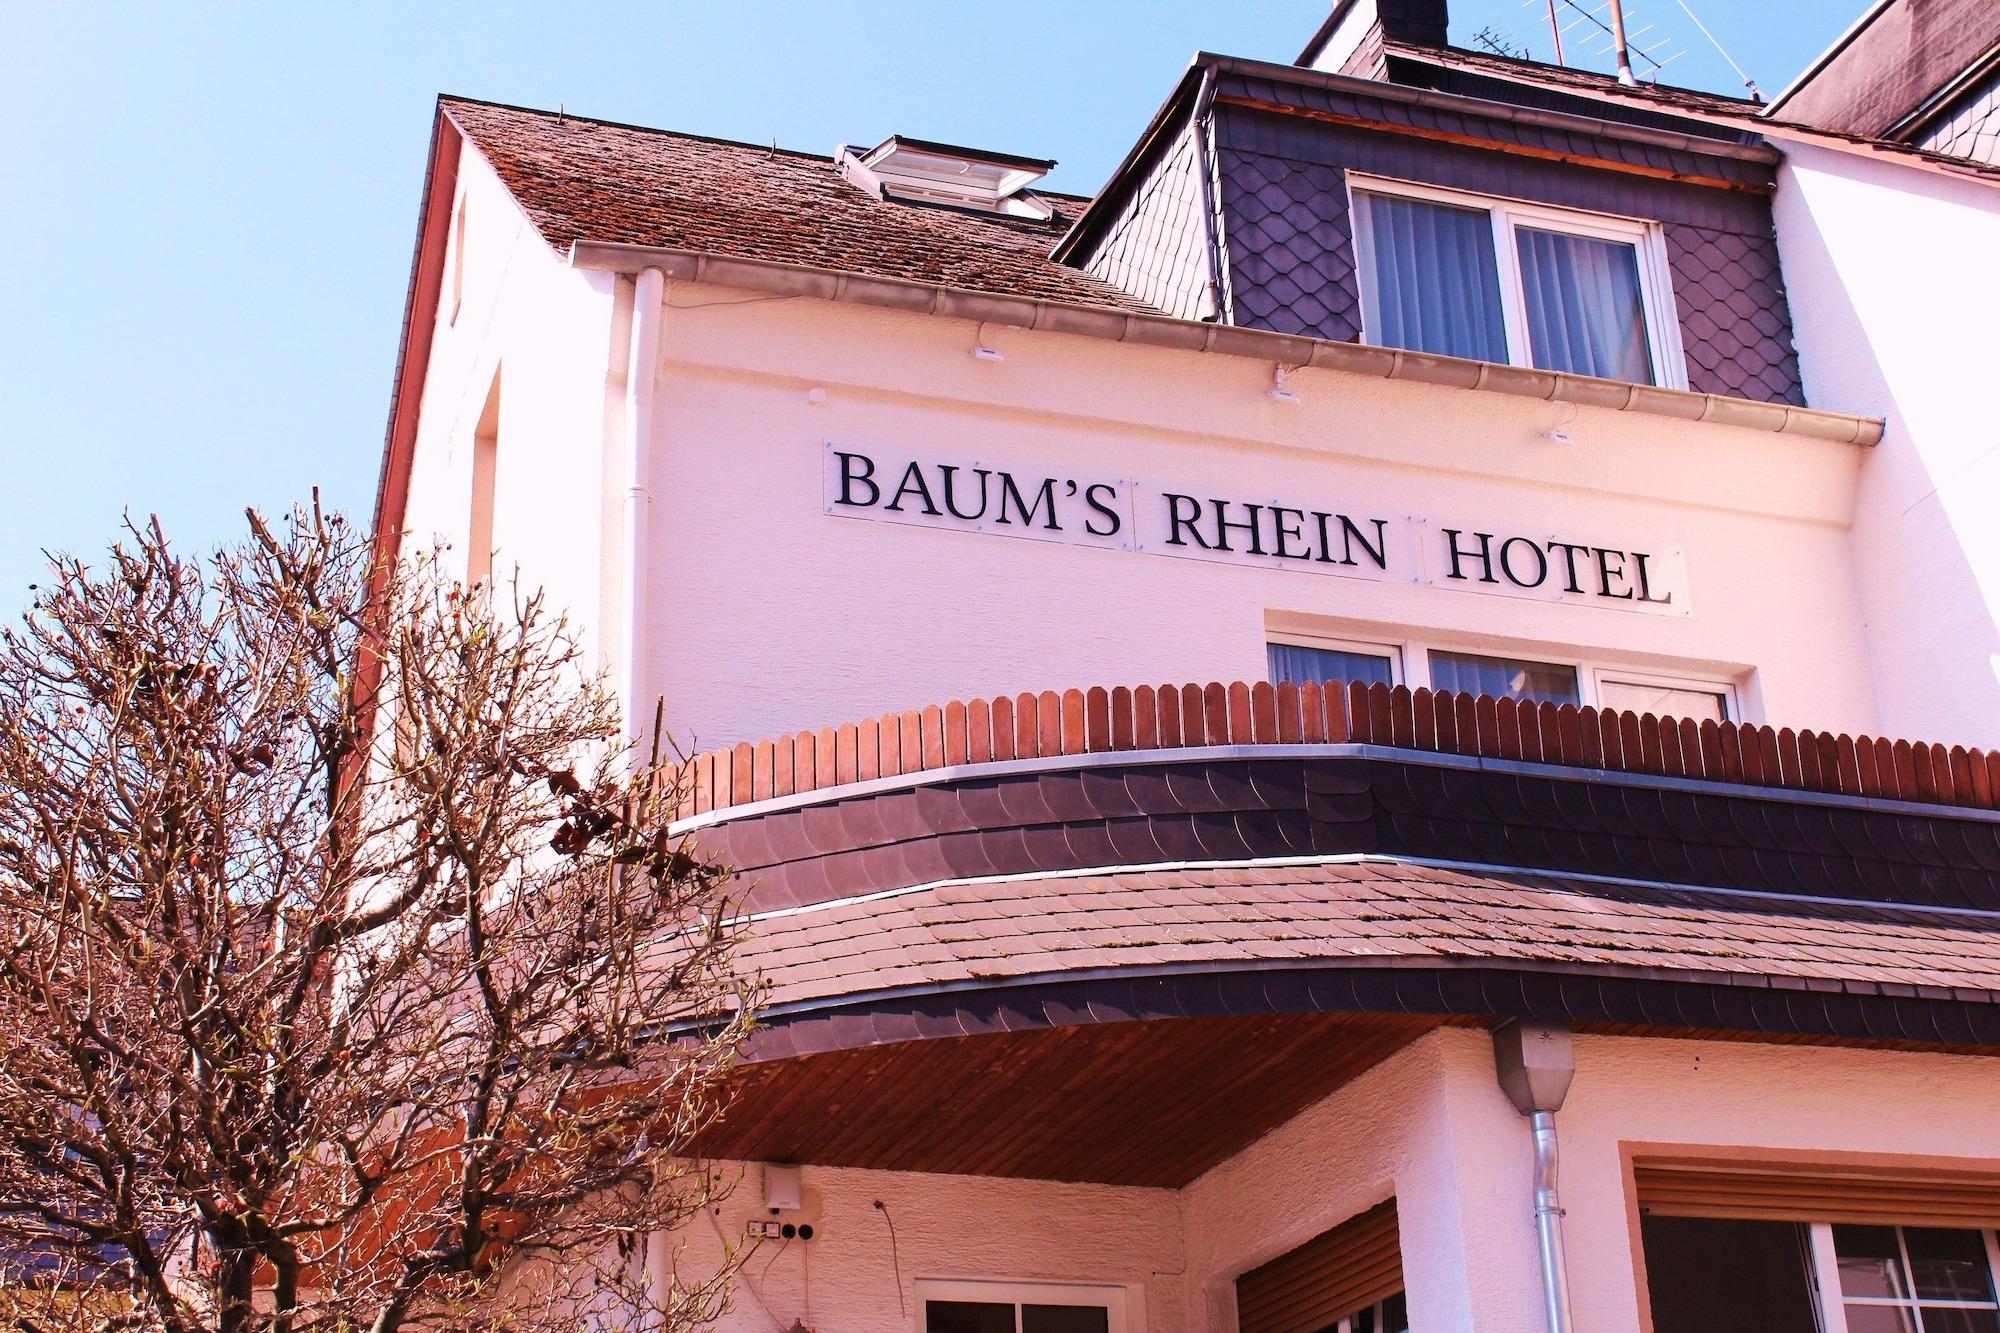 Baums Rheinhotel, Rhein-Hunsrück-Kreis